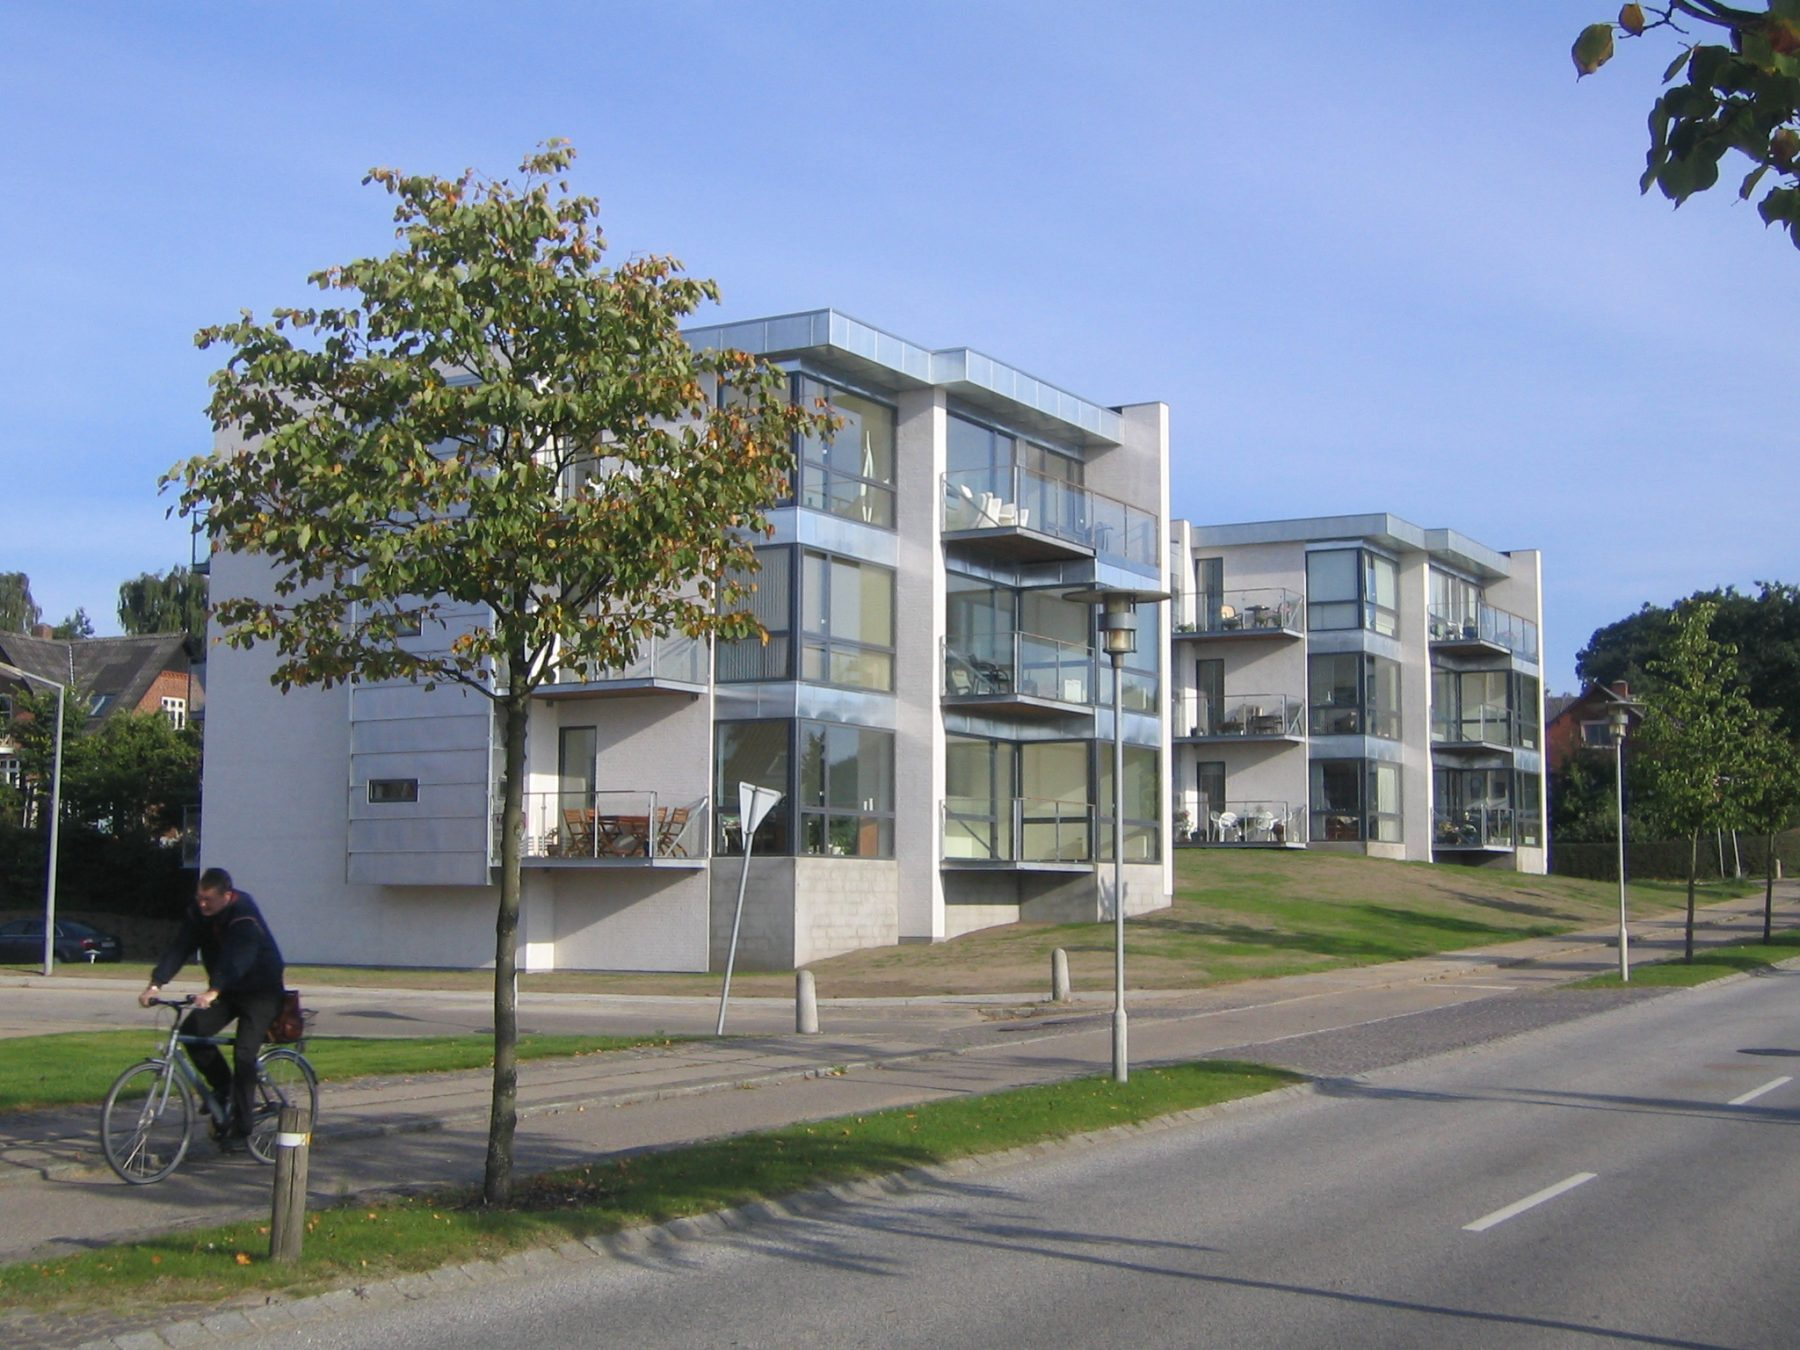 Søbrinken, Skanderborg